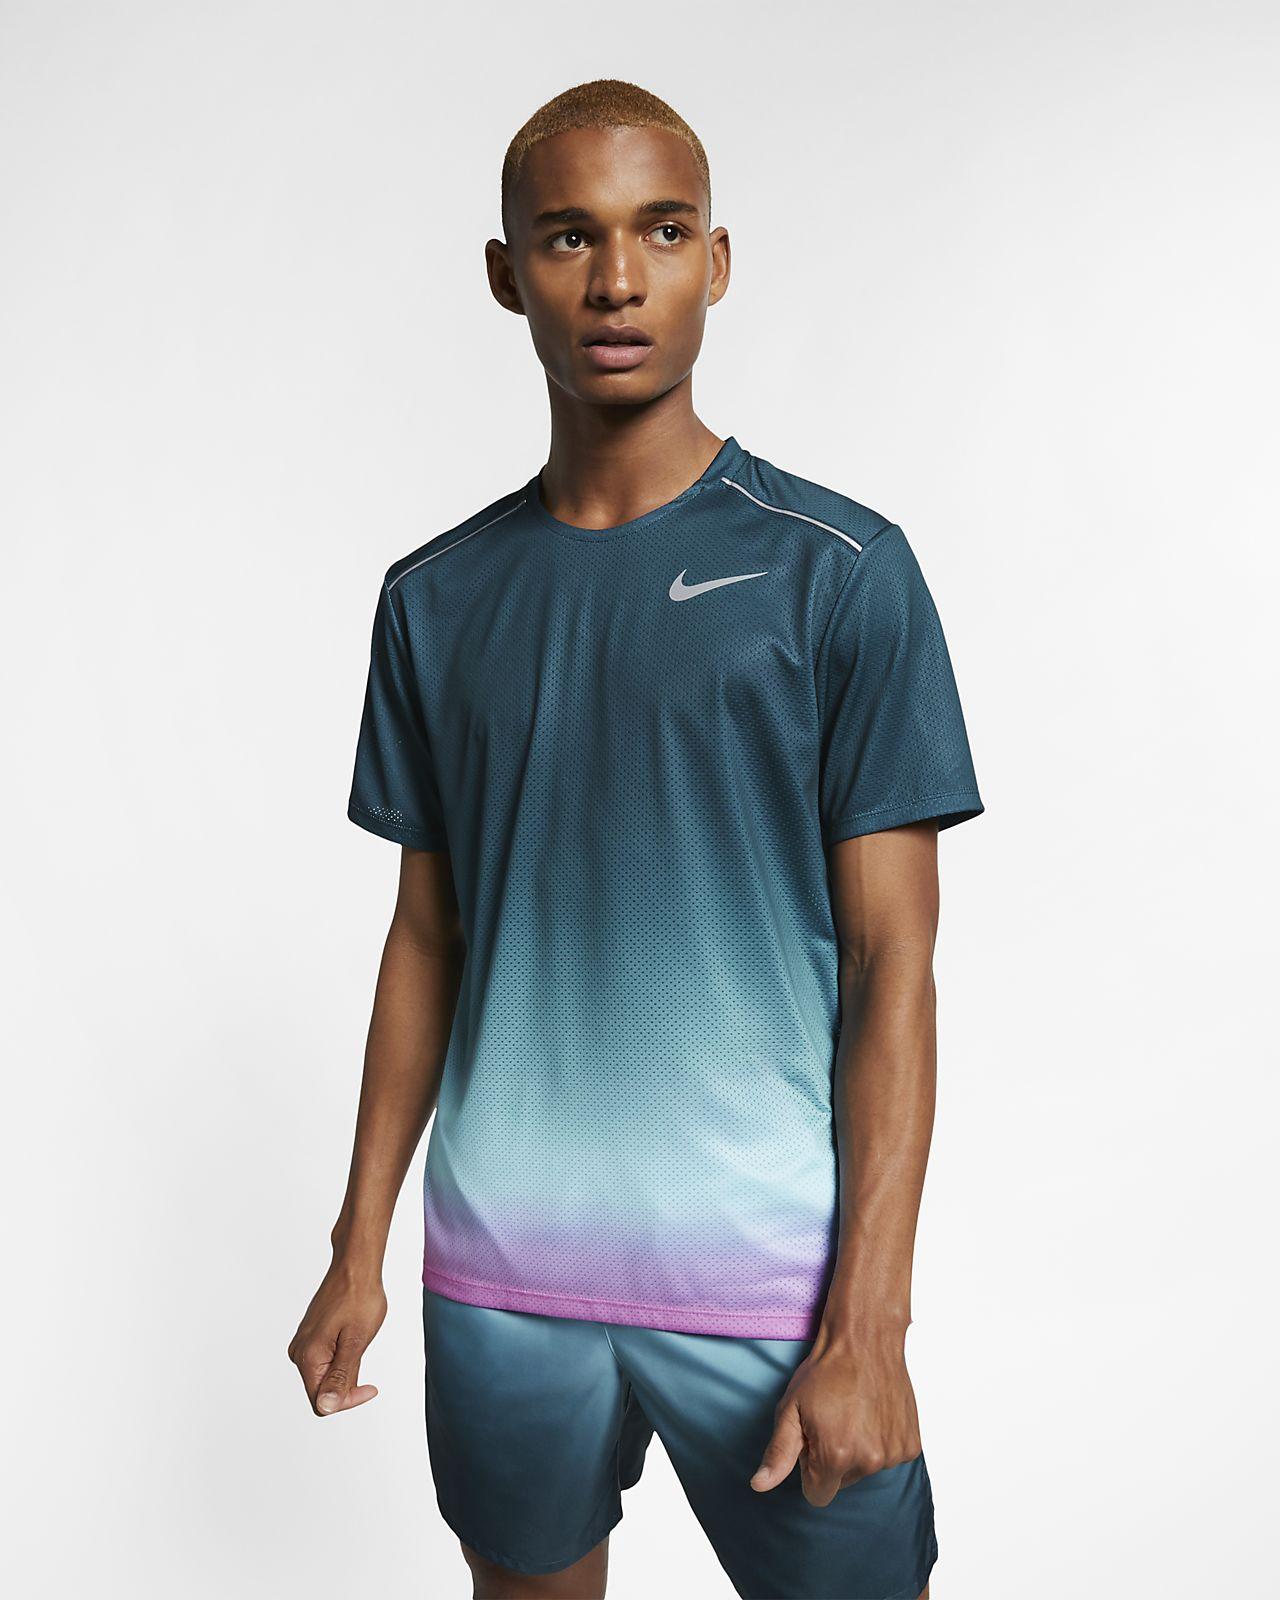 Nike Dri-FIT Miler Camiseta de running de manga corta con estampado - Hombre